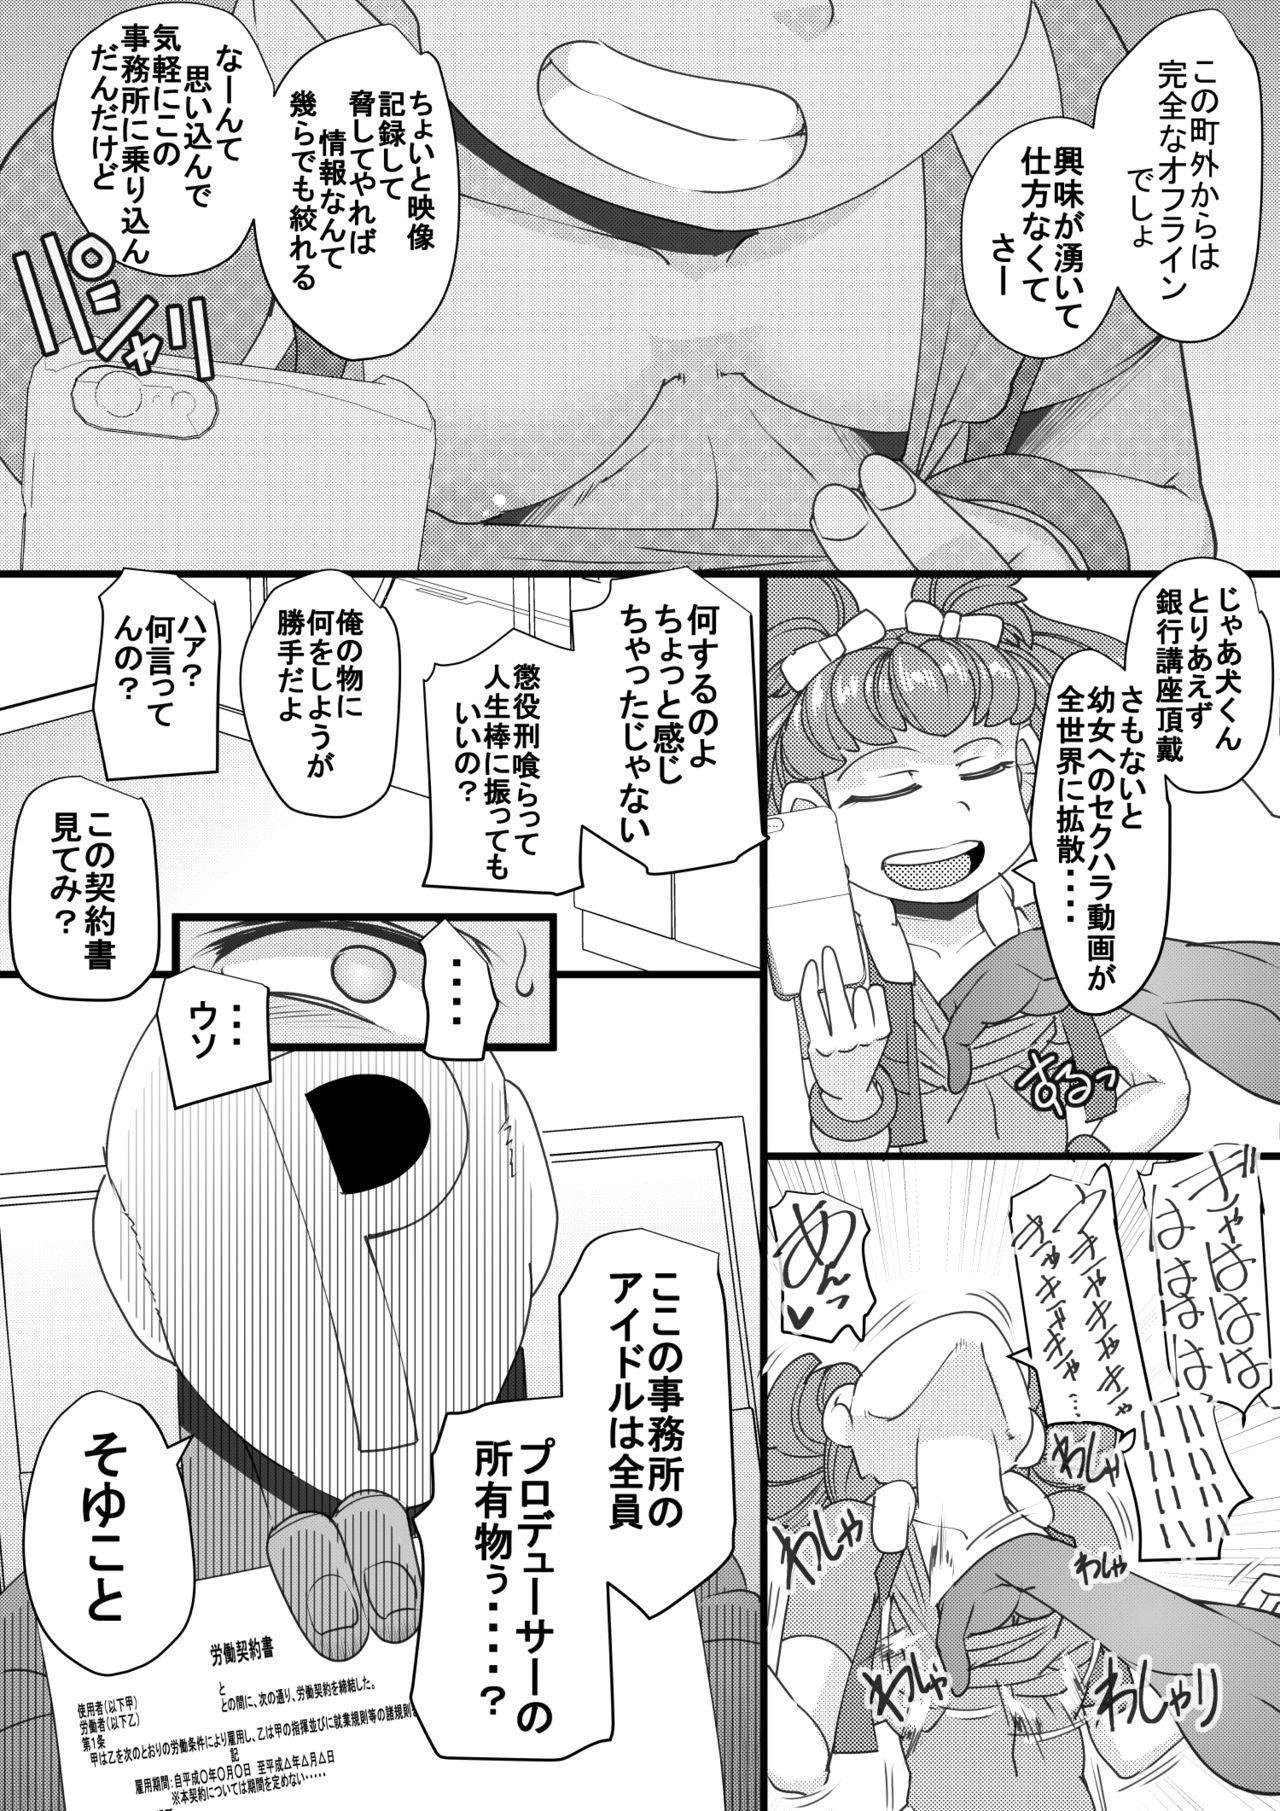 Haramachi 5 14